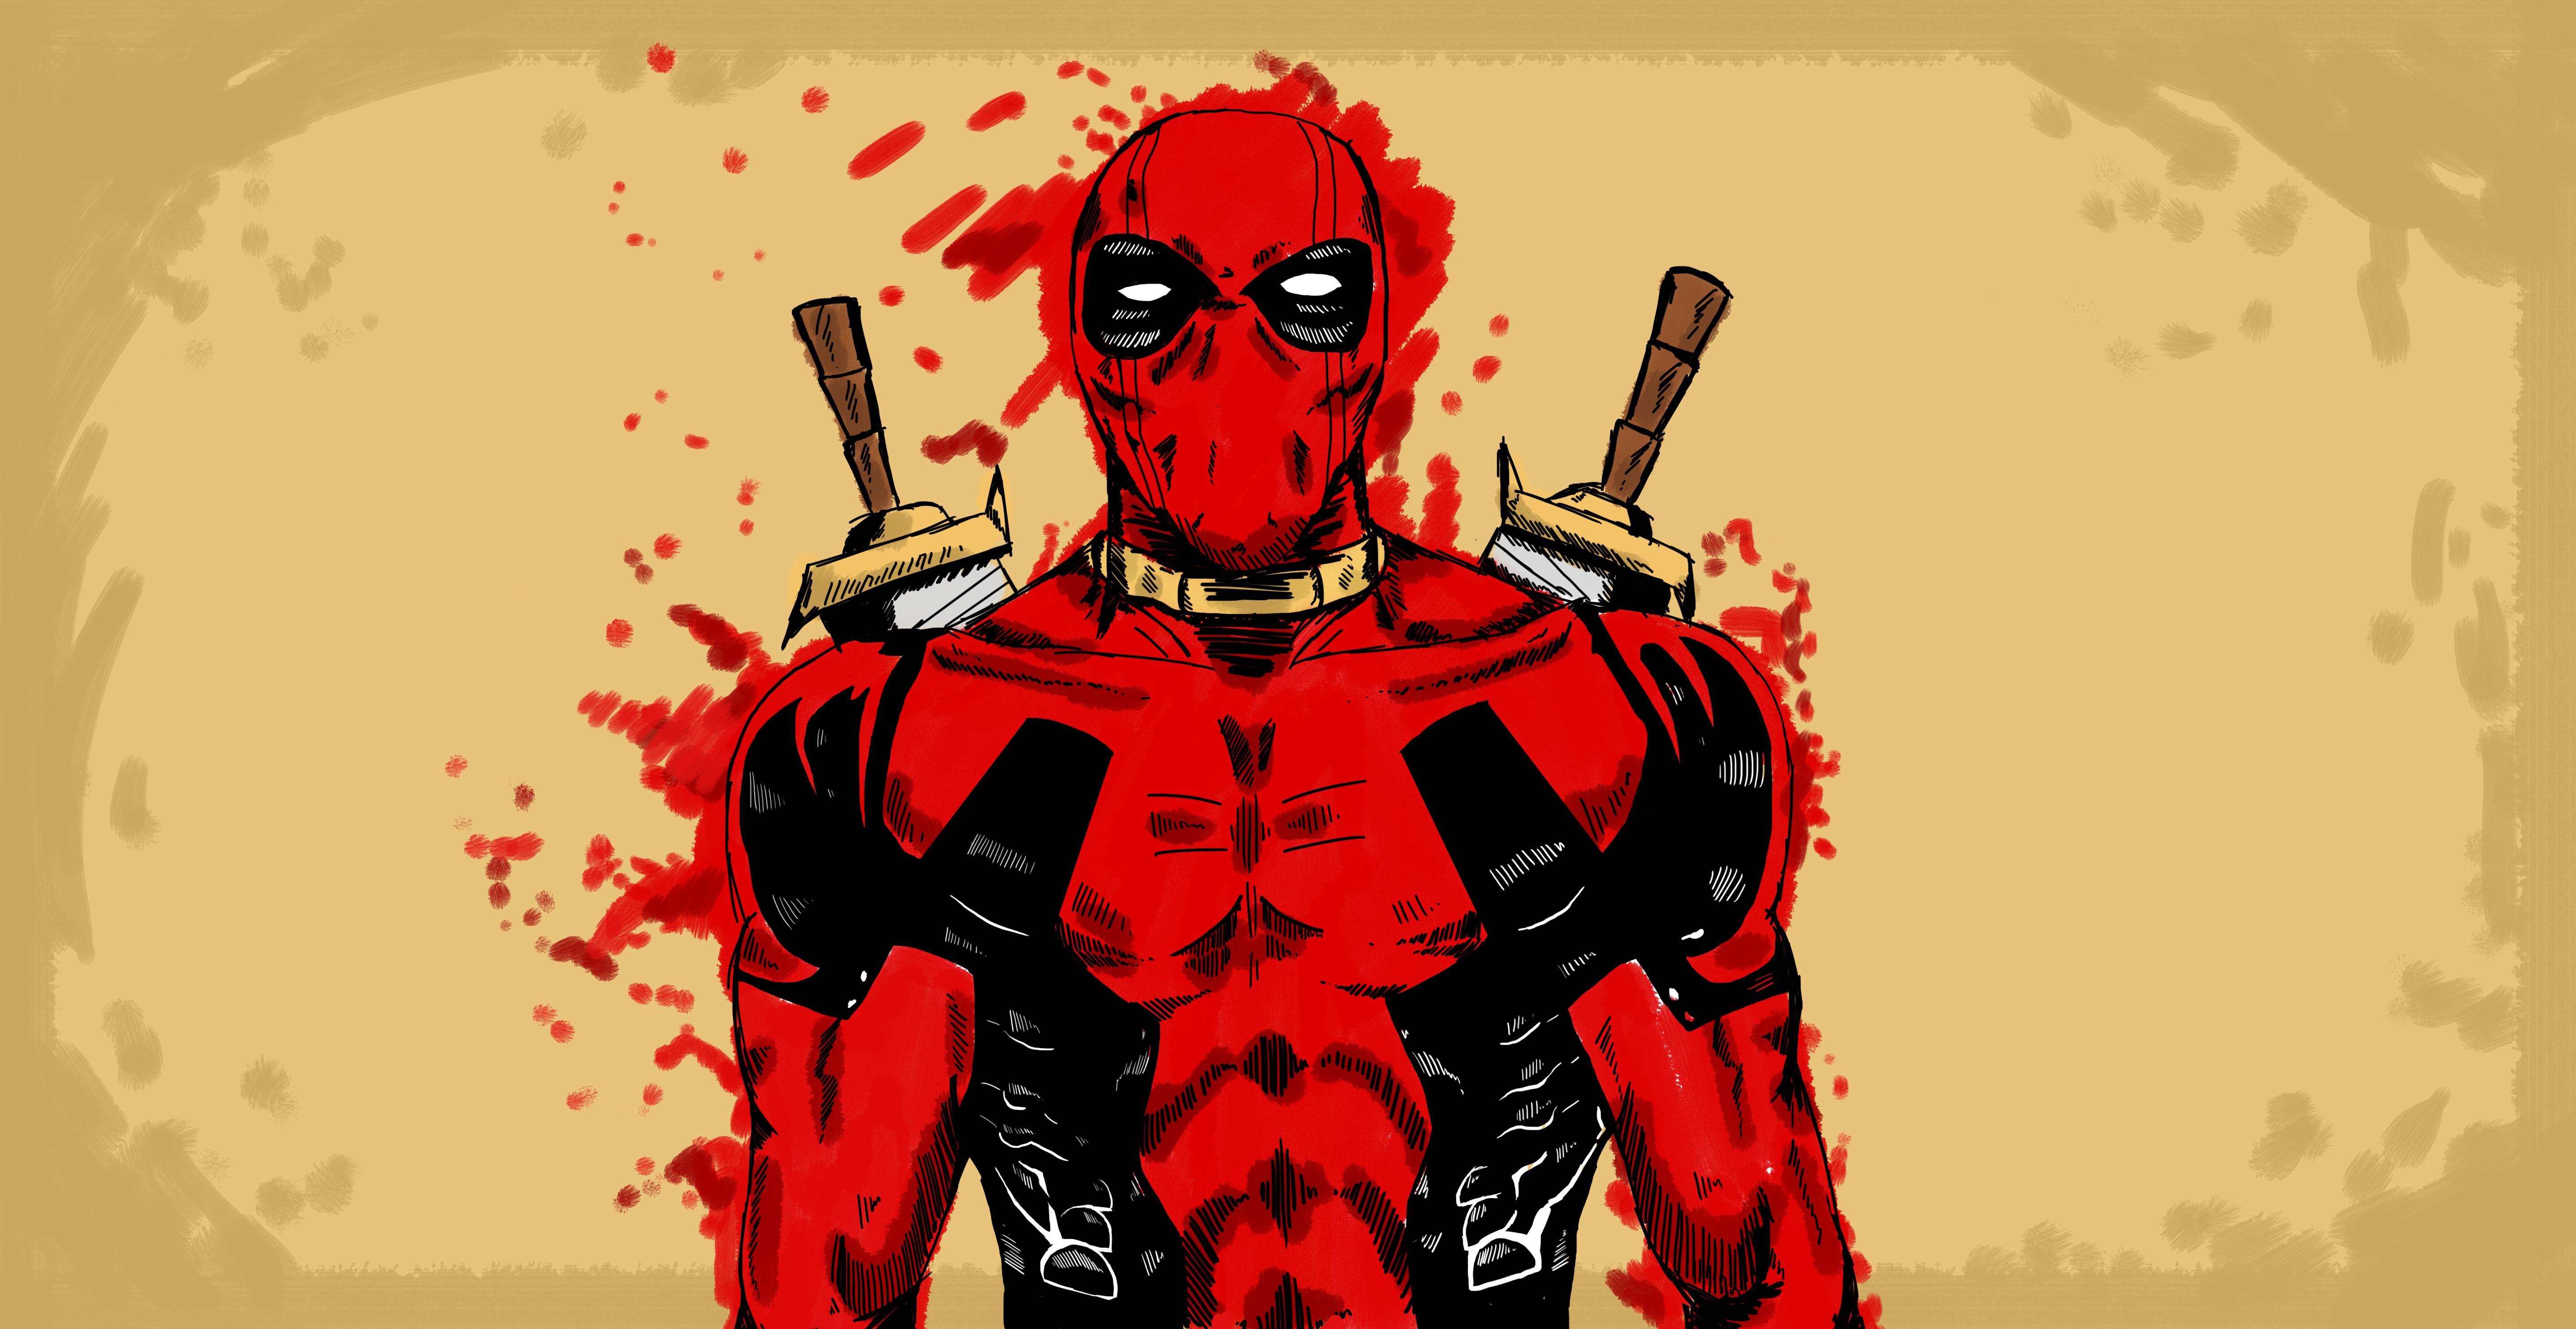 Deadpool movie HD Wallpapers download 5745x2964